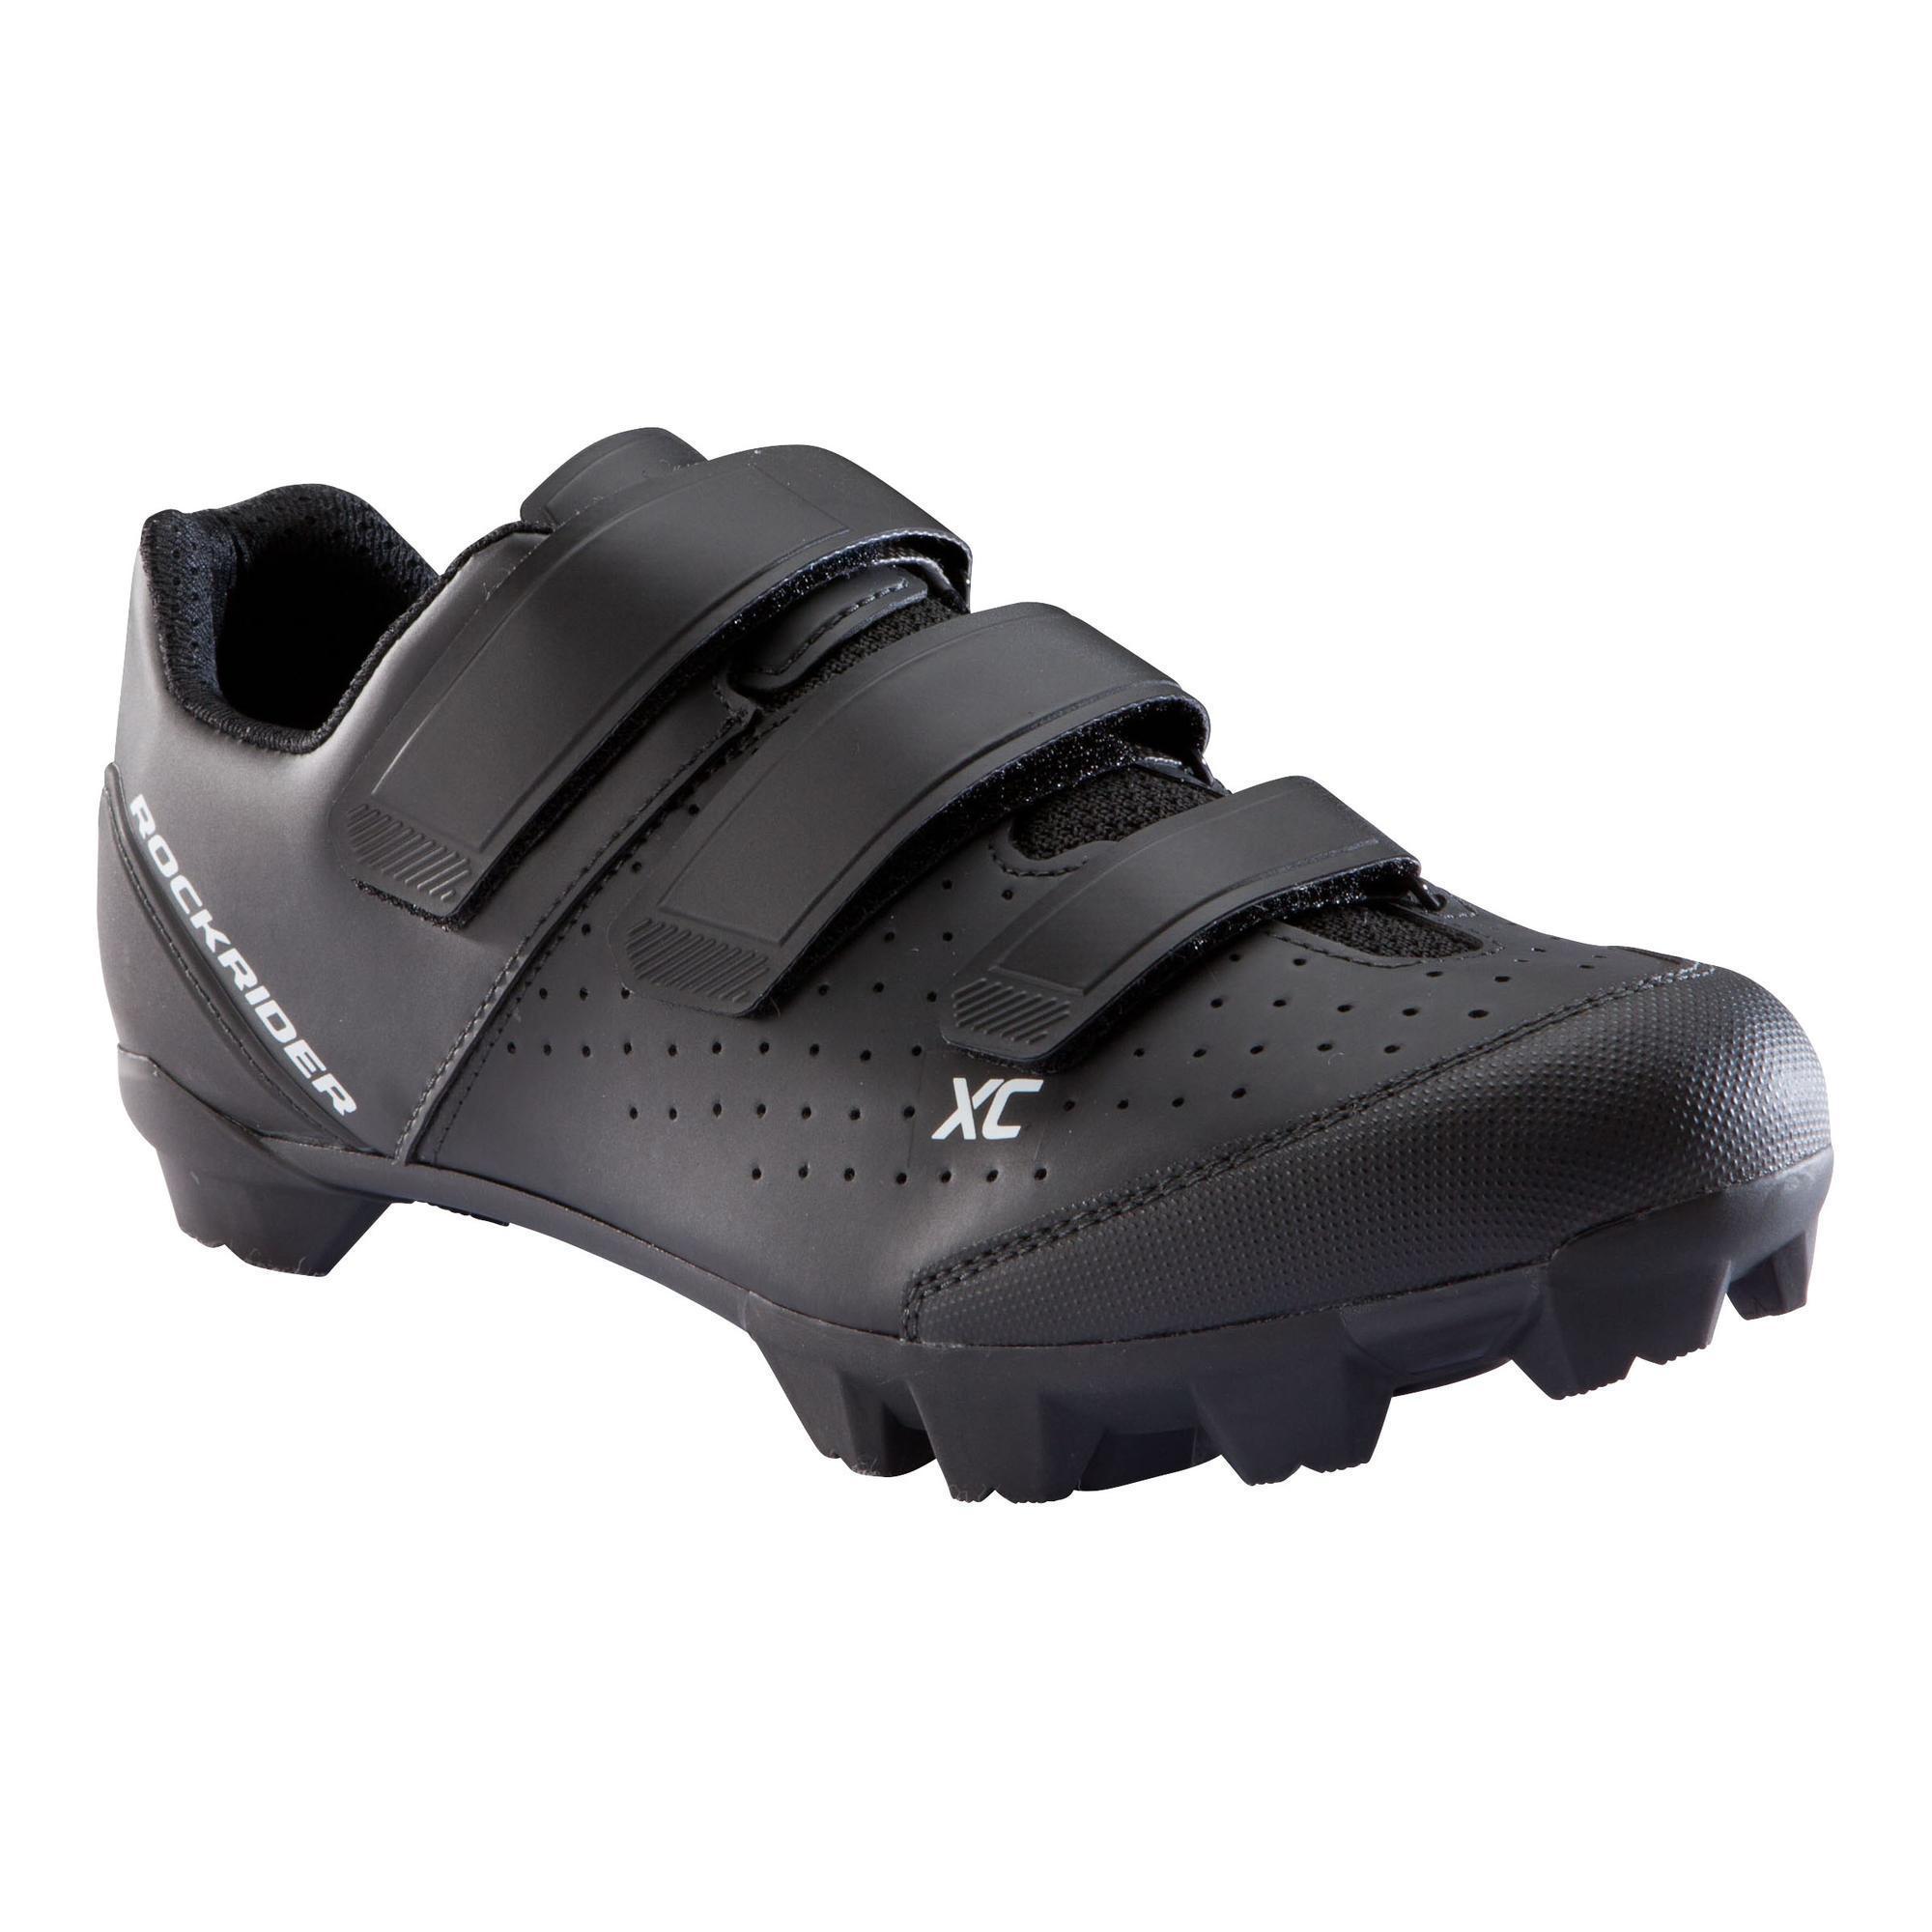 Rockrider MTB-schoenen XC 100 Zwart kopen